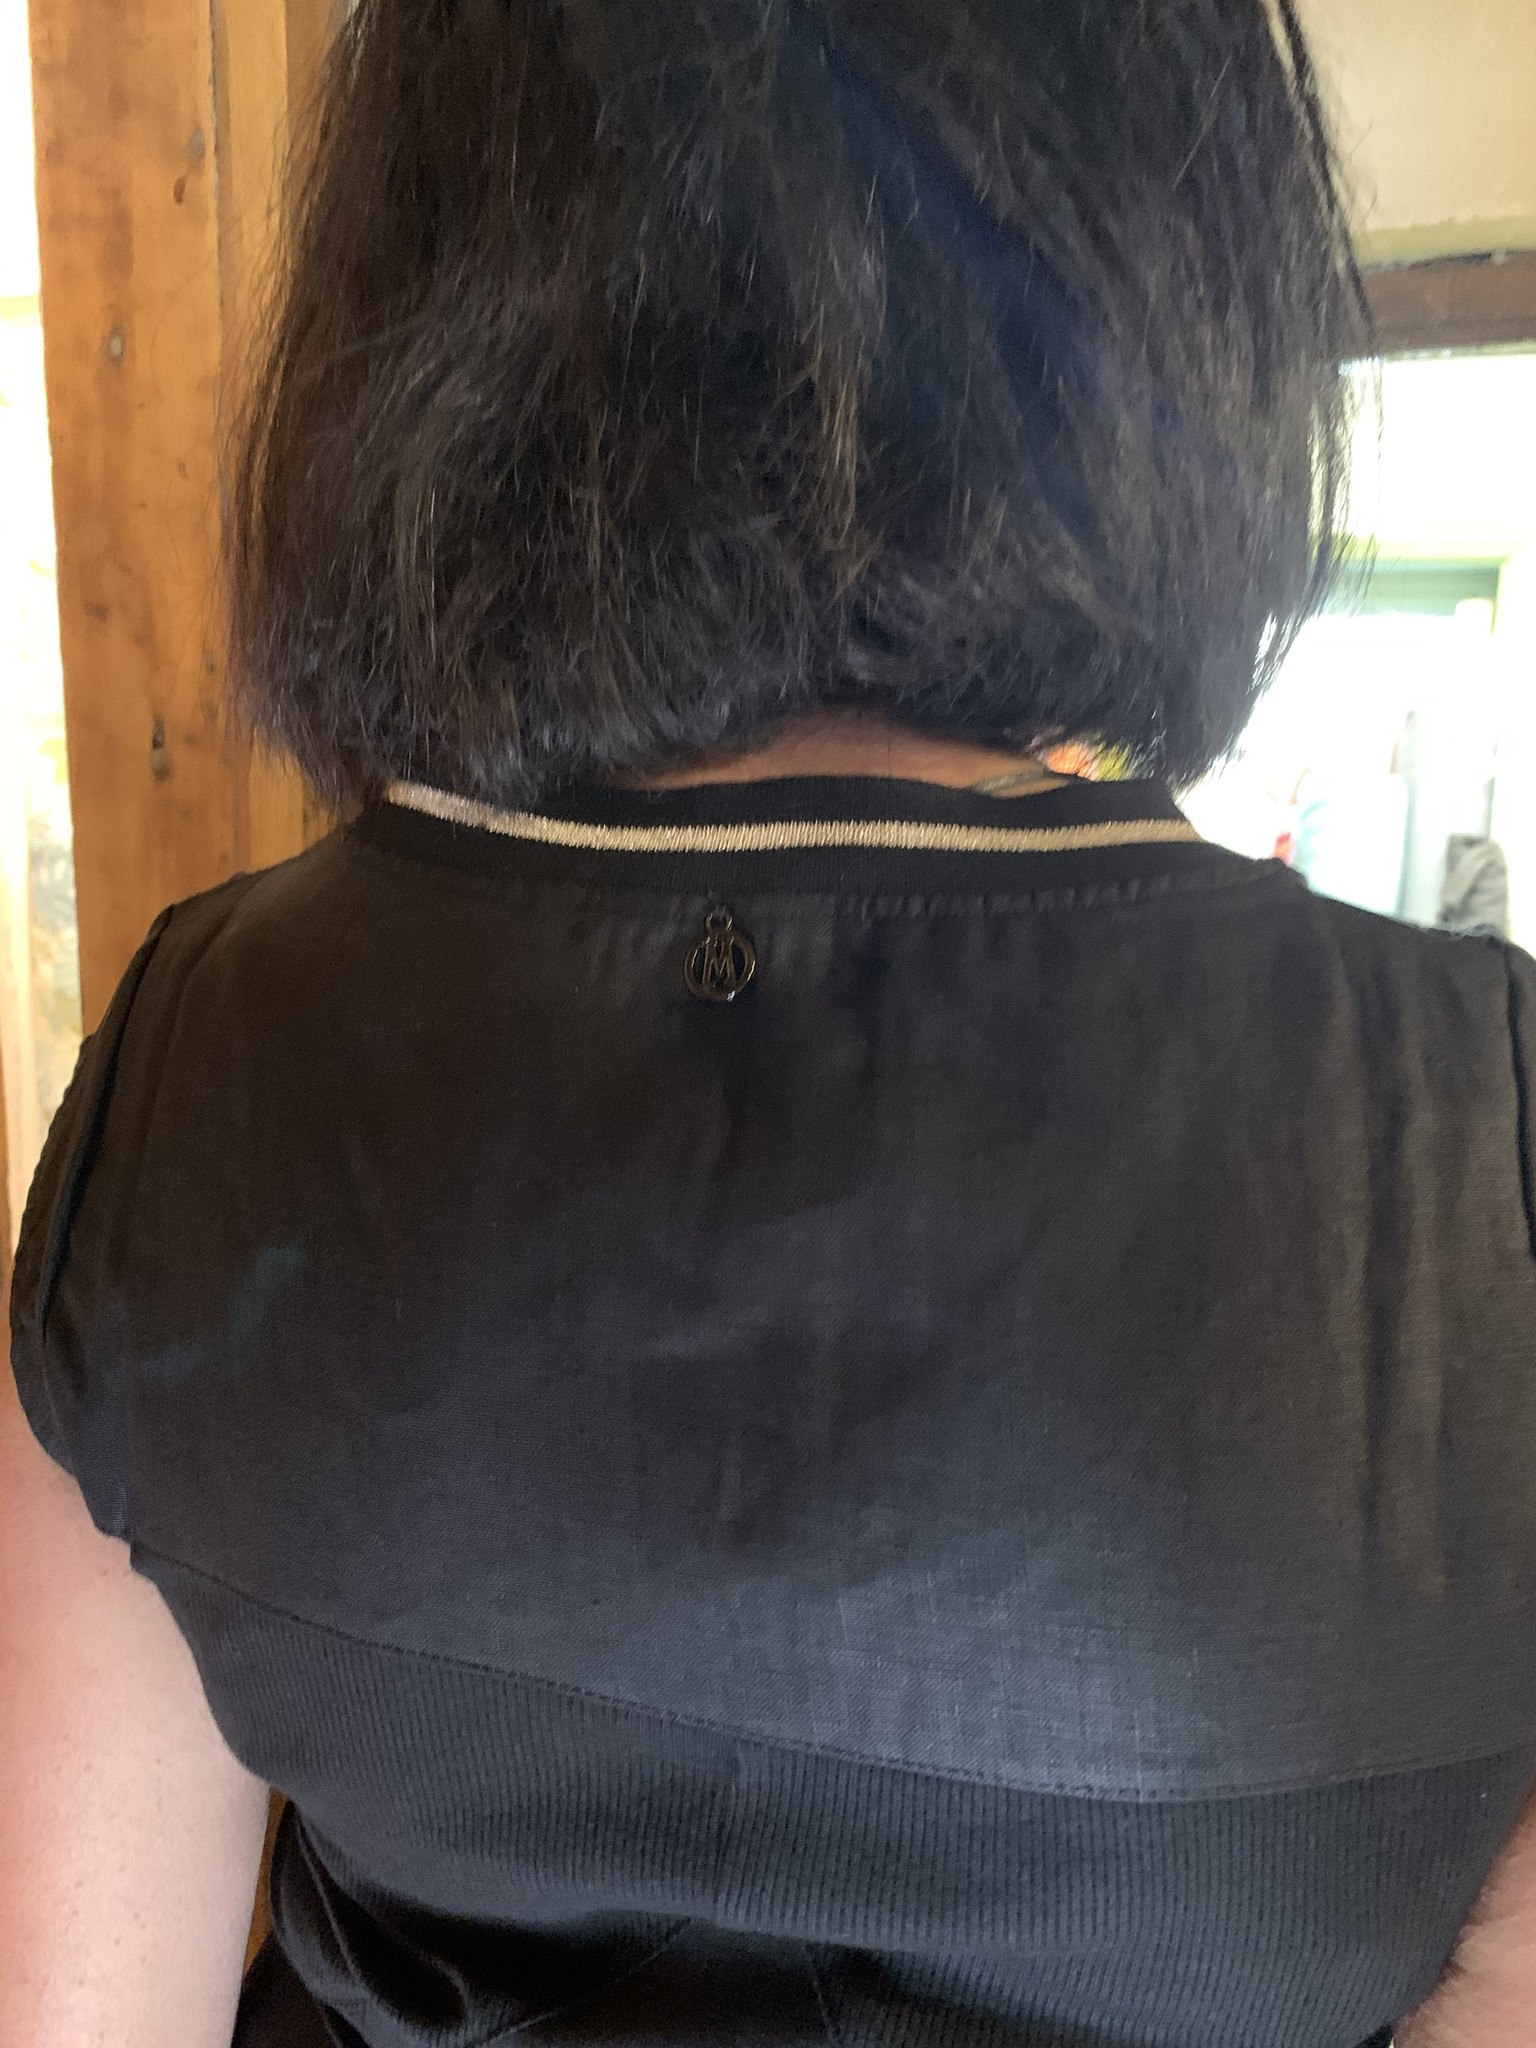 Maloka Black Ryann dress